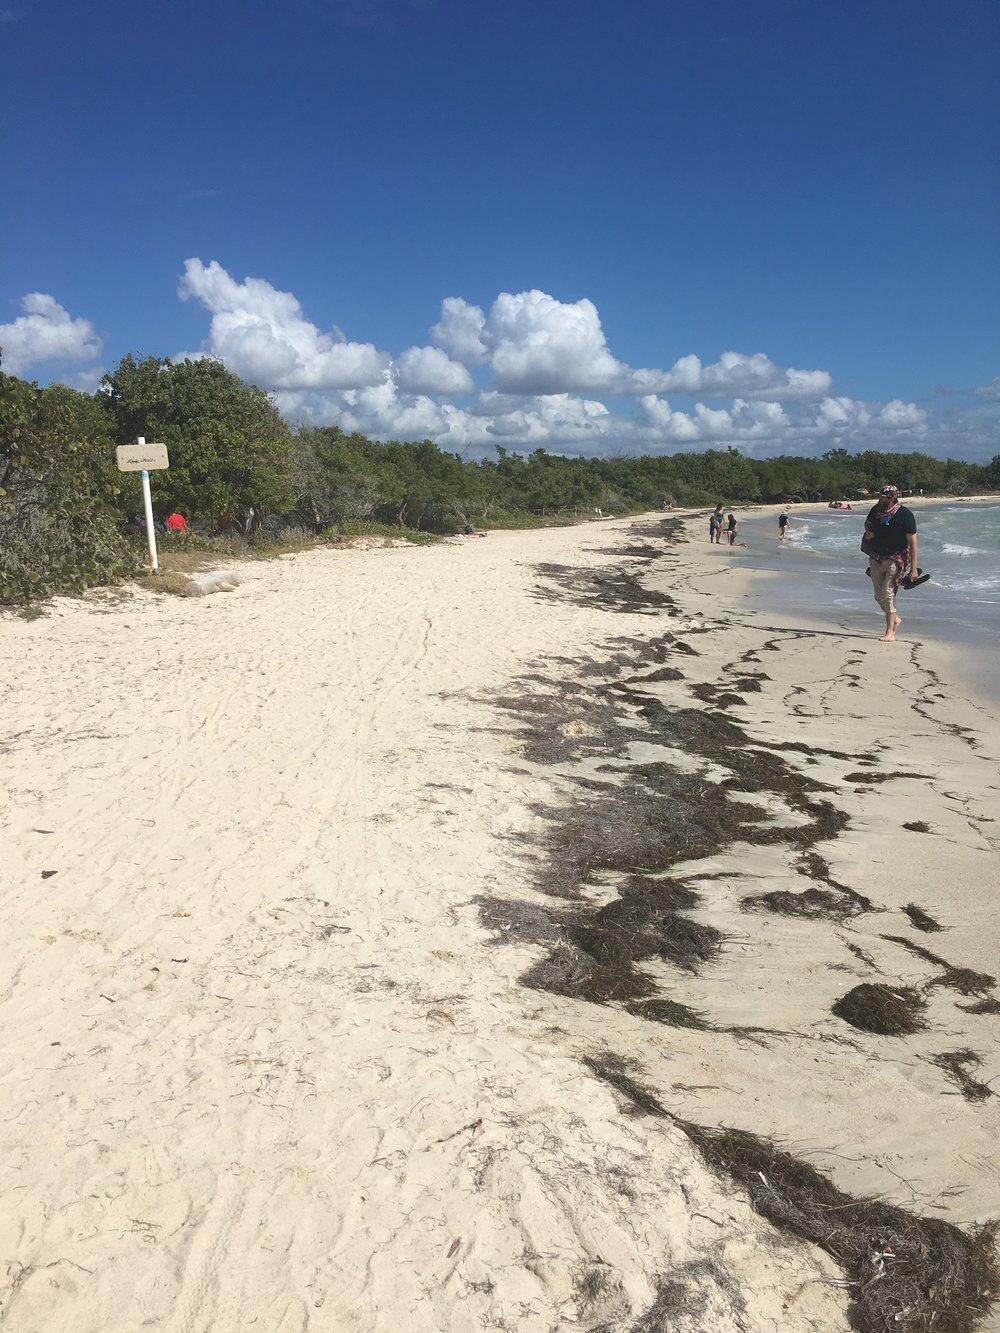 The beach at Playa Sucia